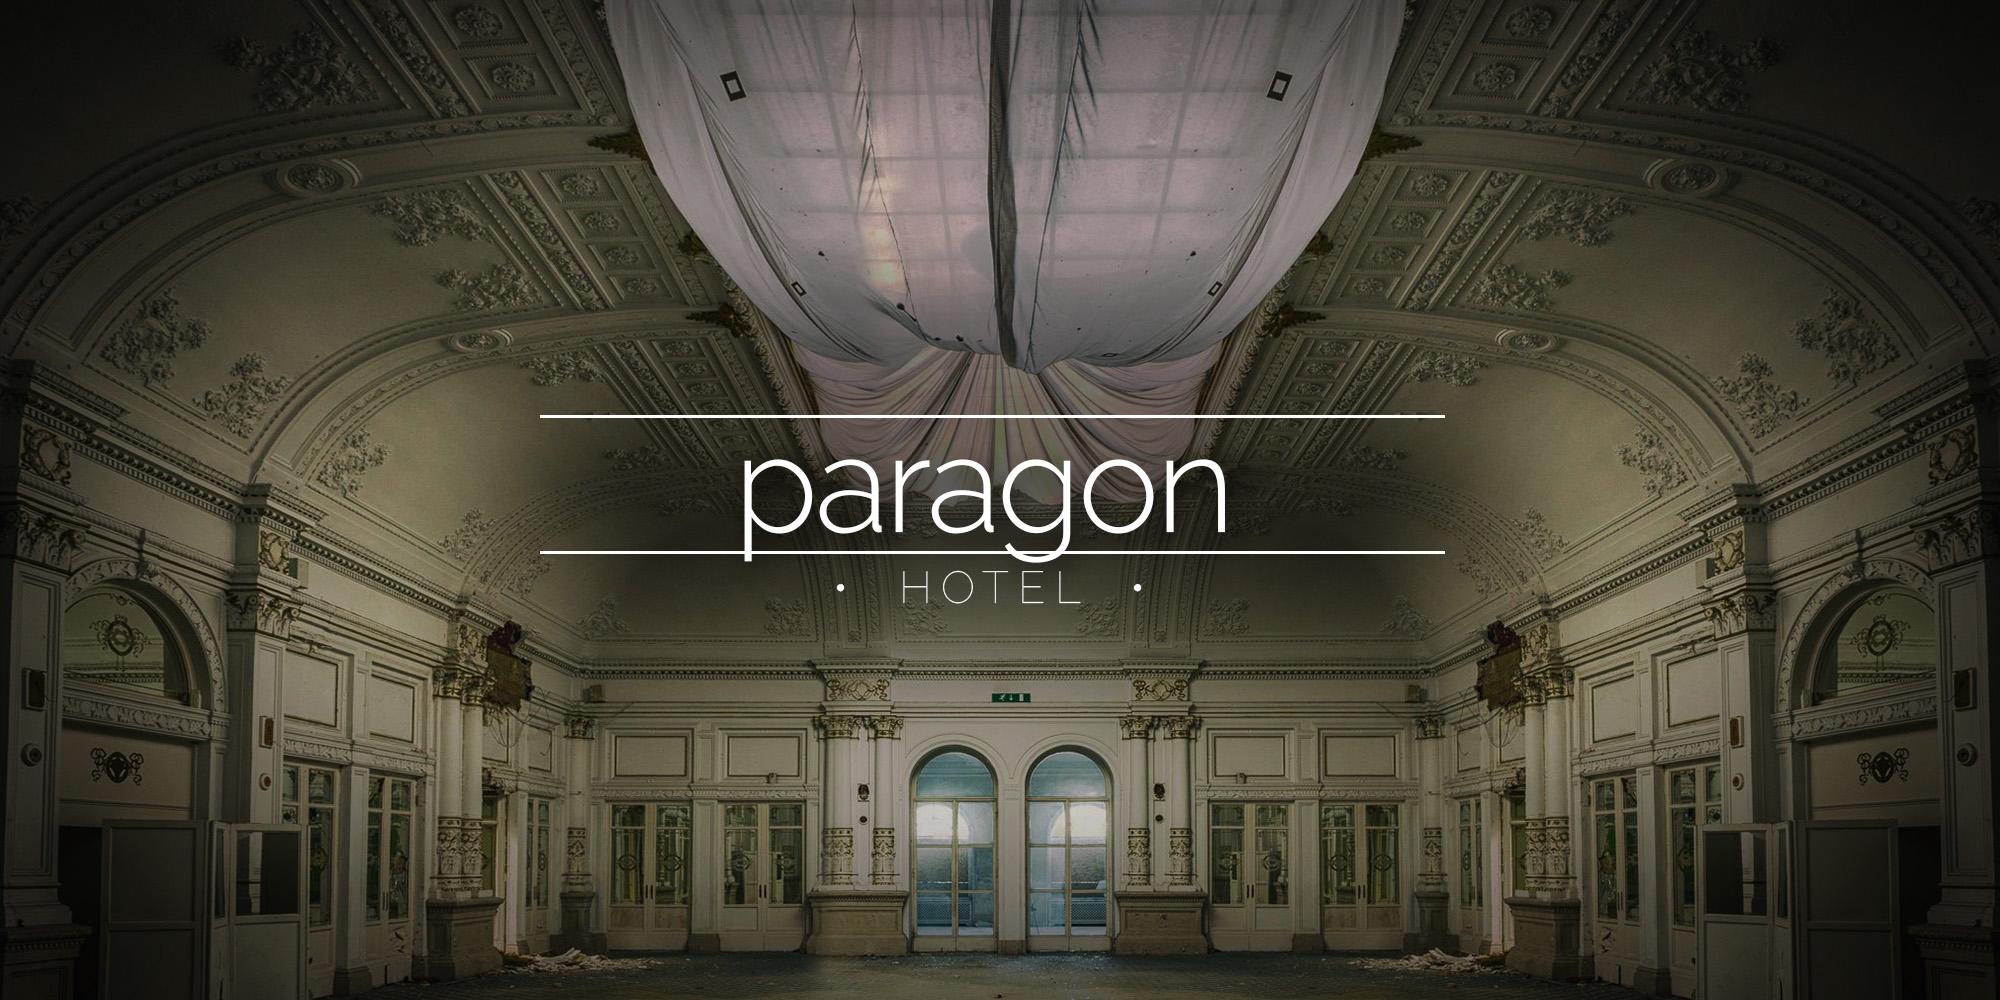 Paragon Hotel Italy